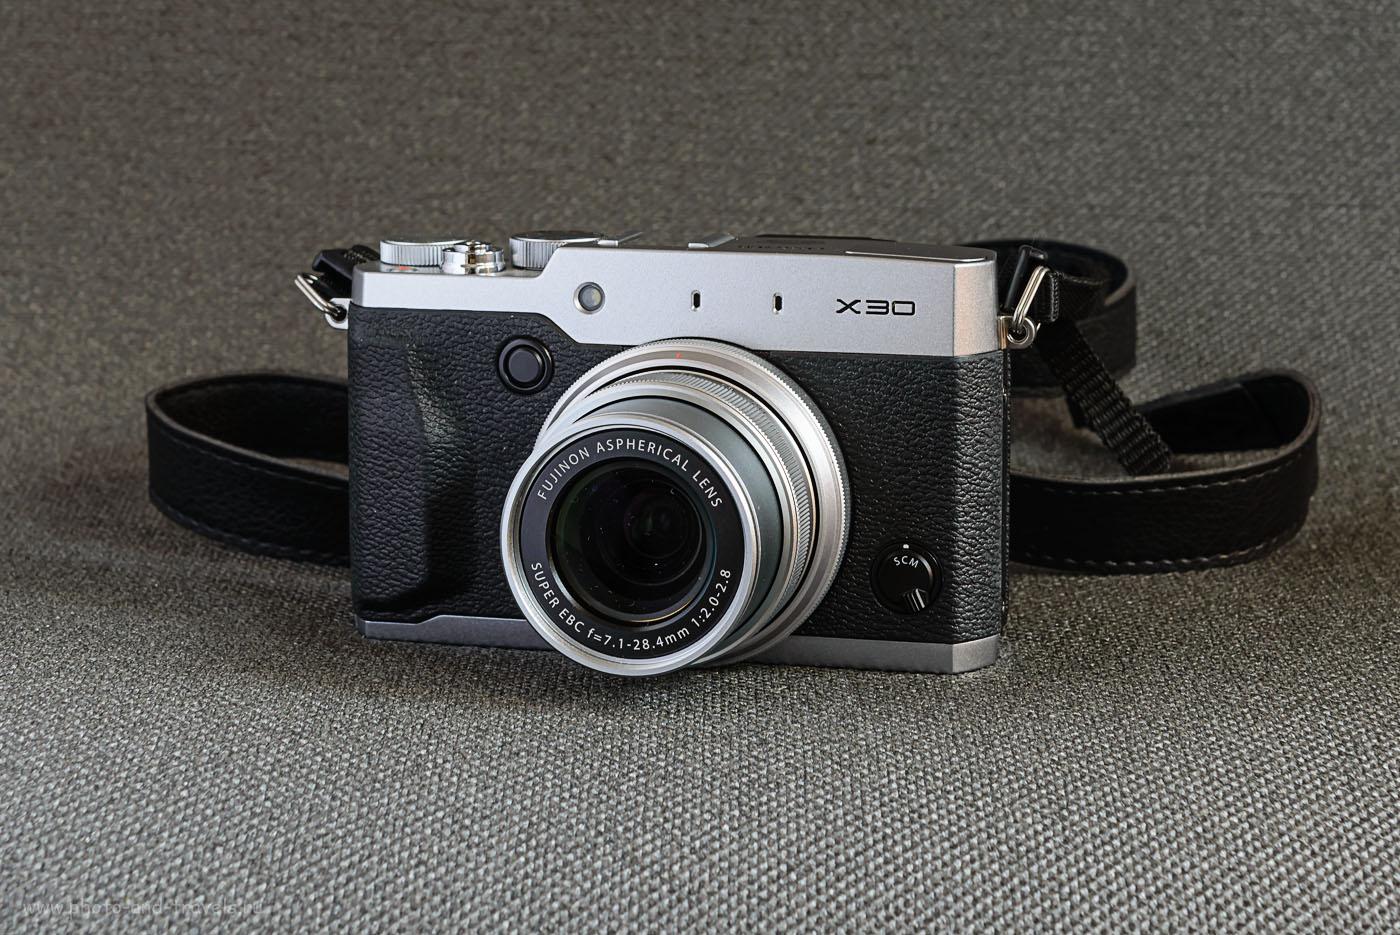 Фото 1. Вид цифрового фотоаппарата Fujifilm X30 в комплекте с внешней вспышкой Fujifilm EF-42. Камера установлена на карбоновый штатив Sirui T-2204X с головкой G20KX.